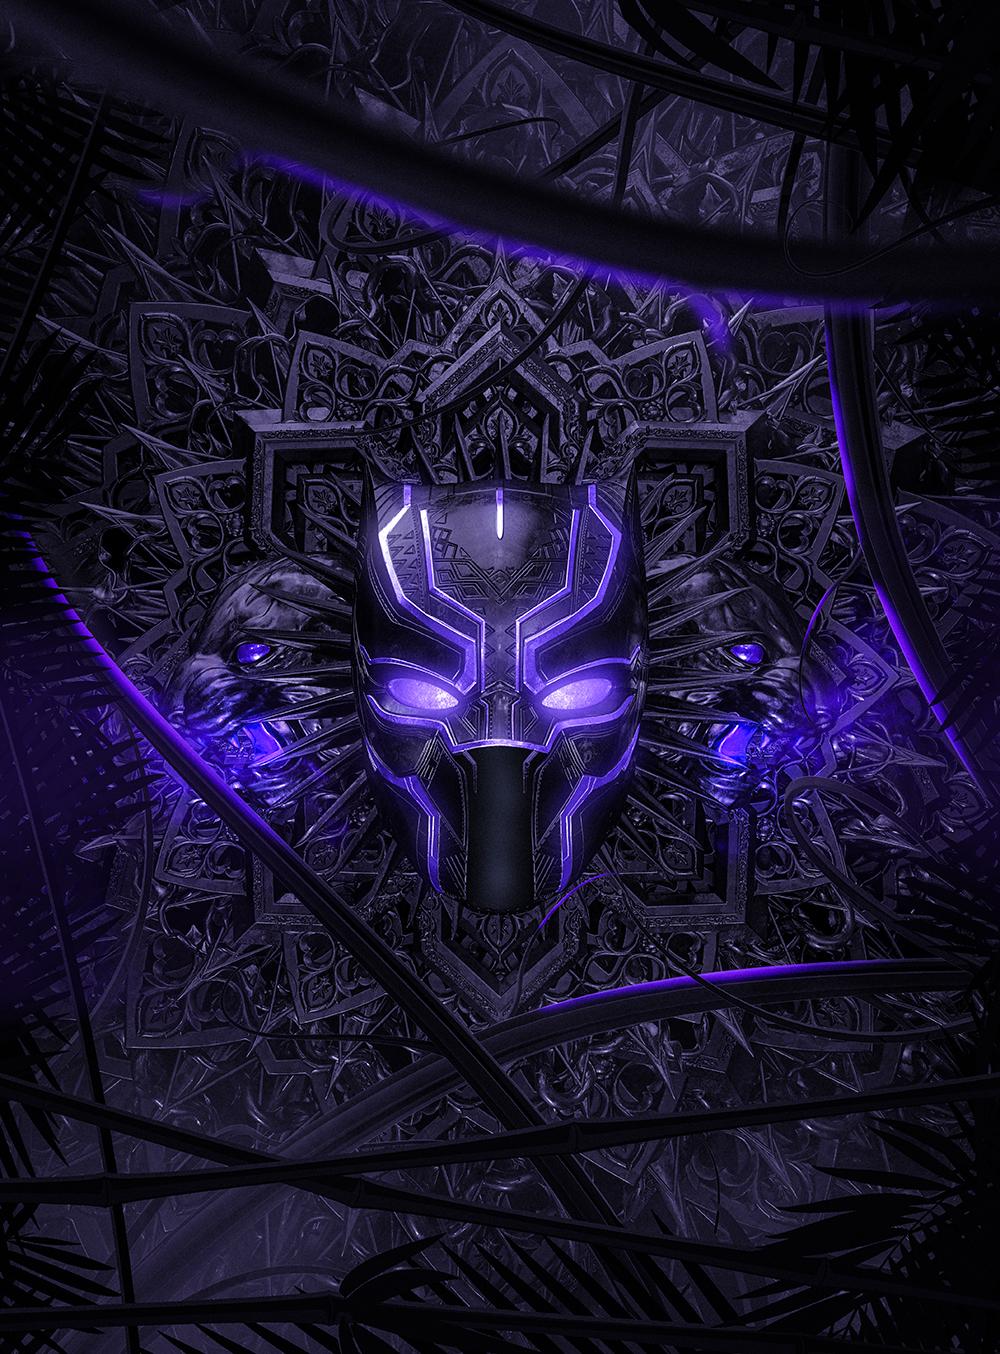 3d Dragon Eye Wallpaper Amazing Digital Illustrations For The Marvel Black Panther